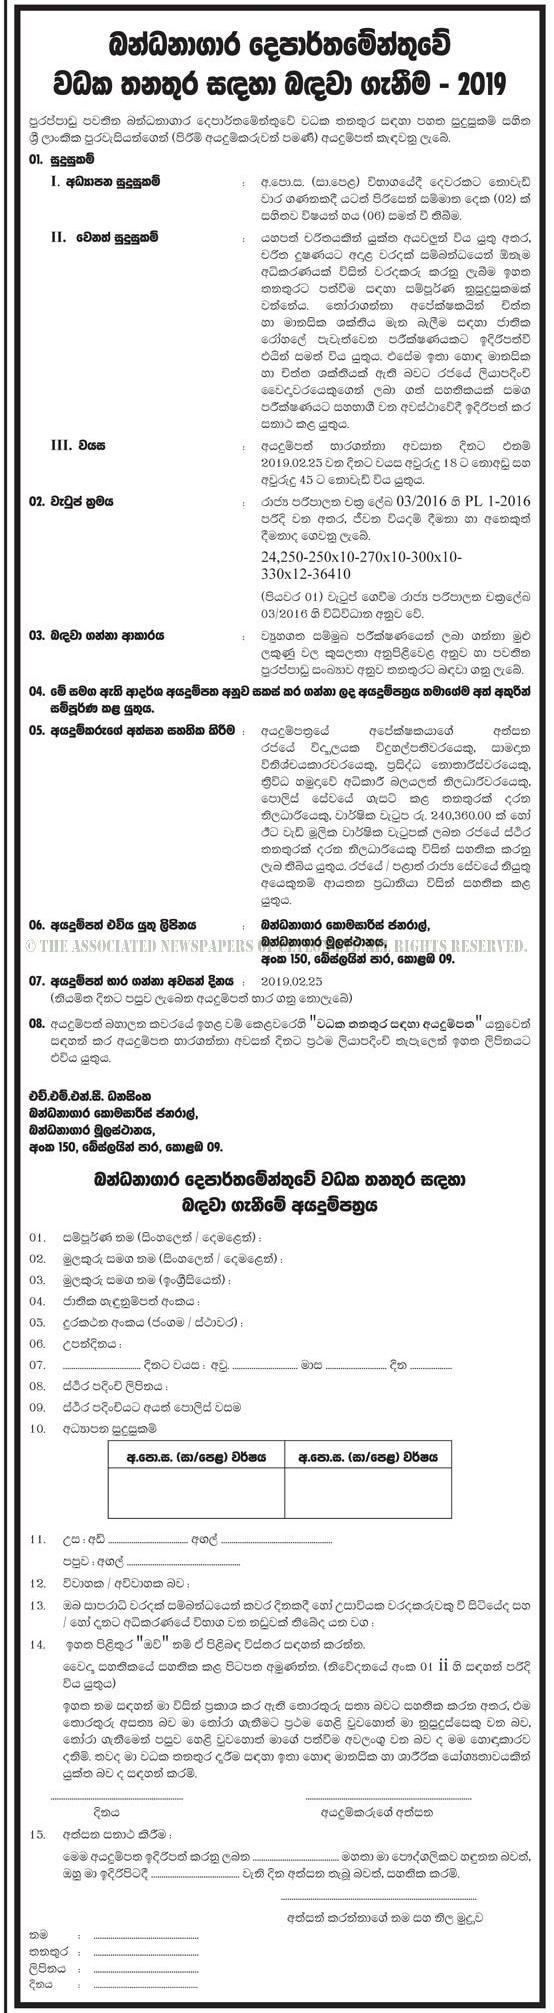 Executioner - Department of Prisons Job Vacancies